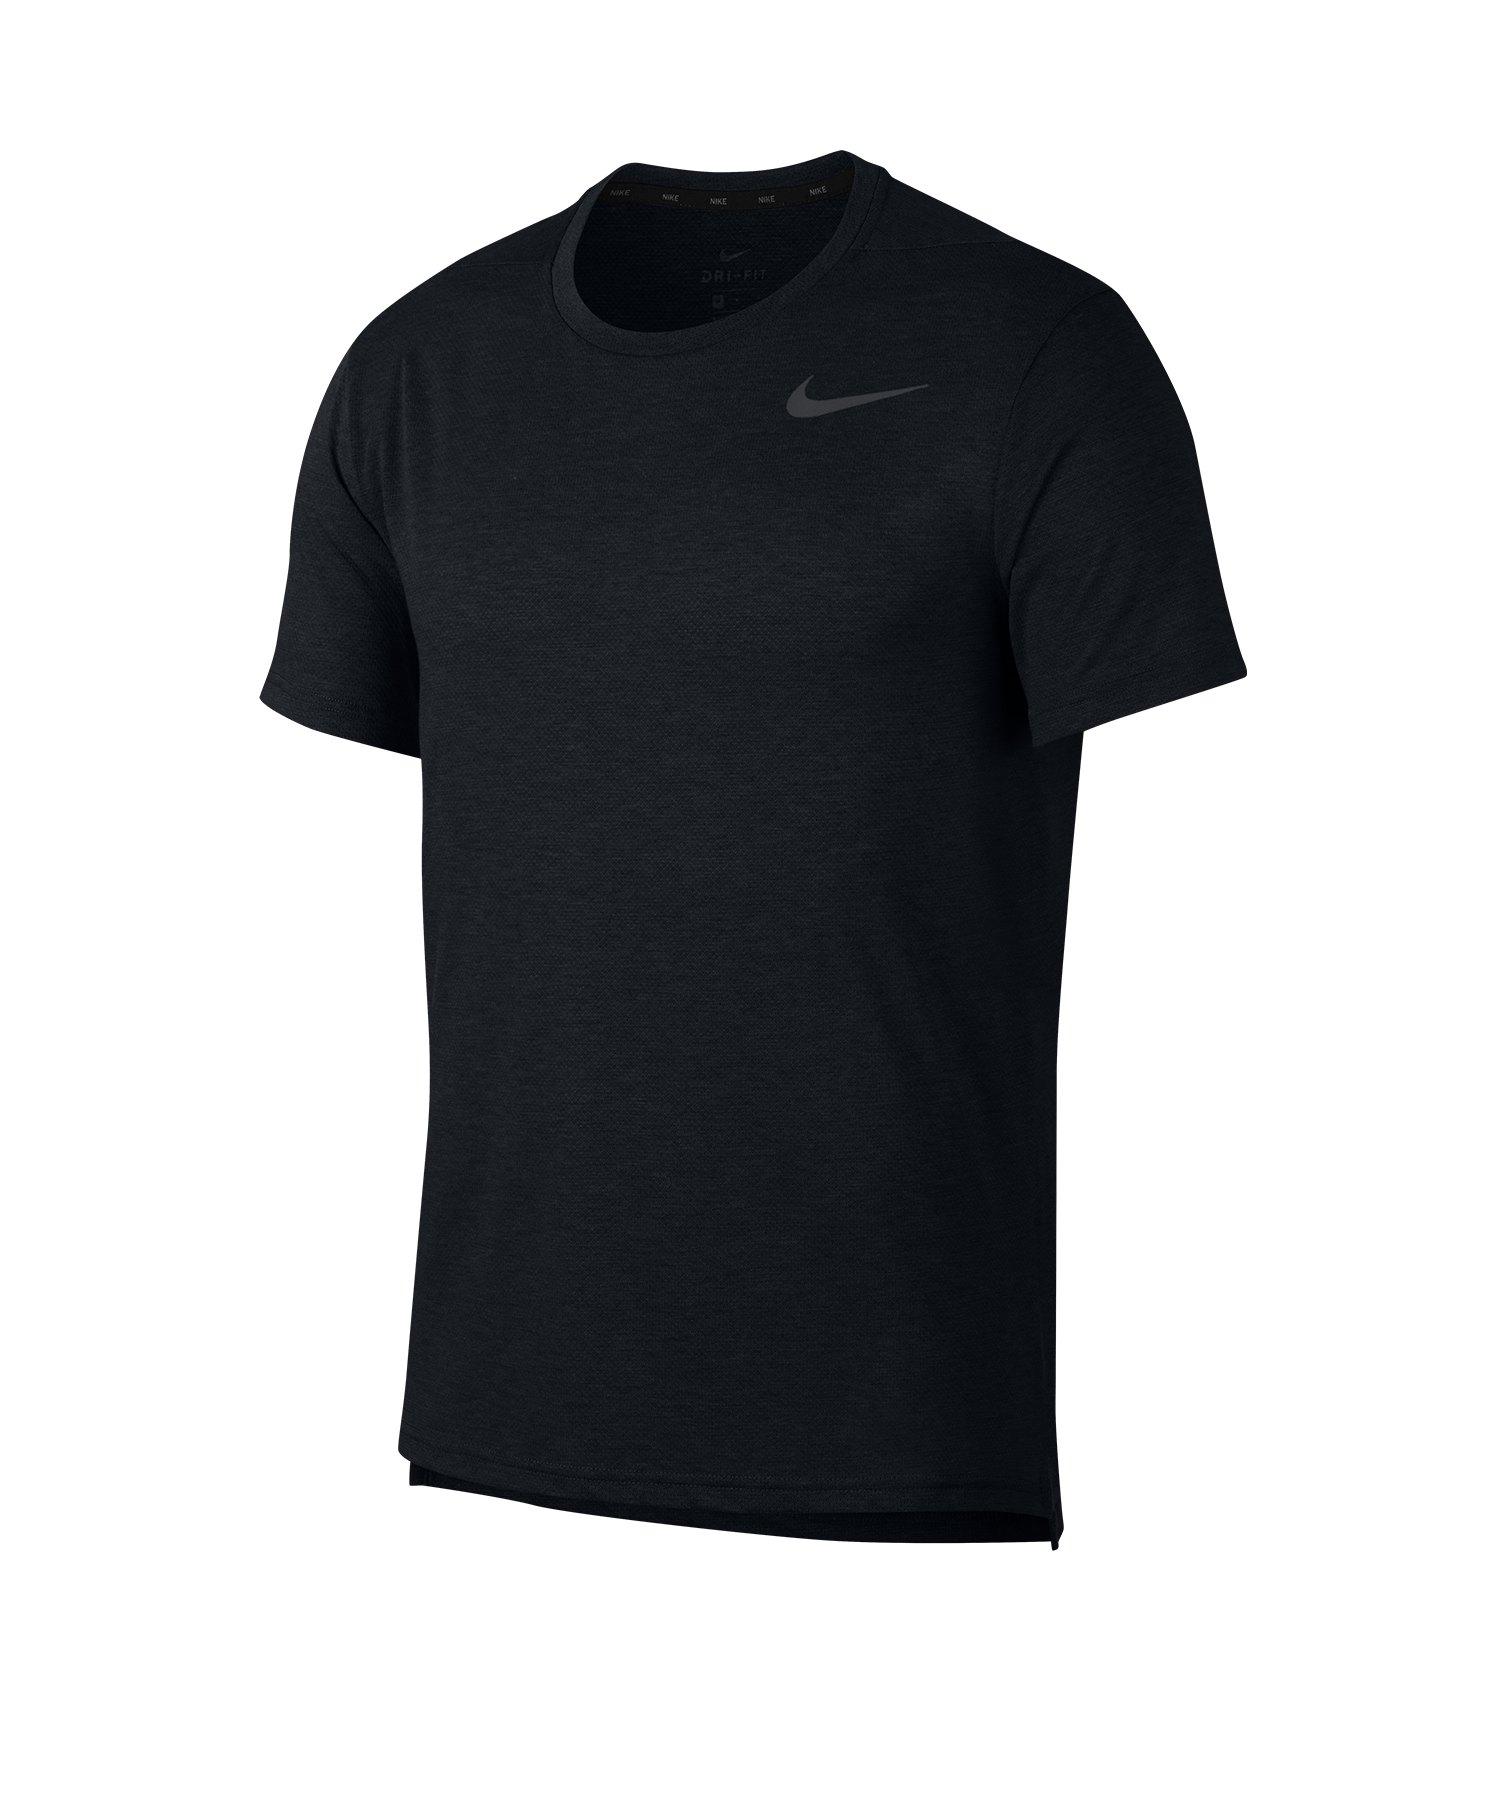 Nike Breathe Dri-FIT T-Shirt Schwarz F032 - schwarz